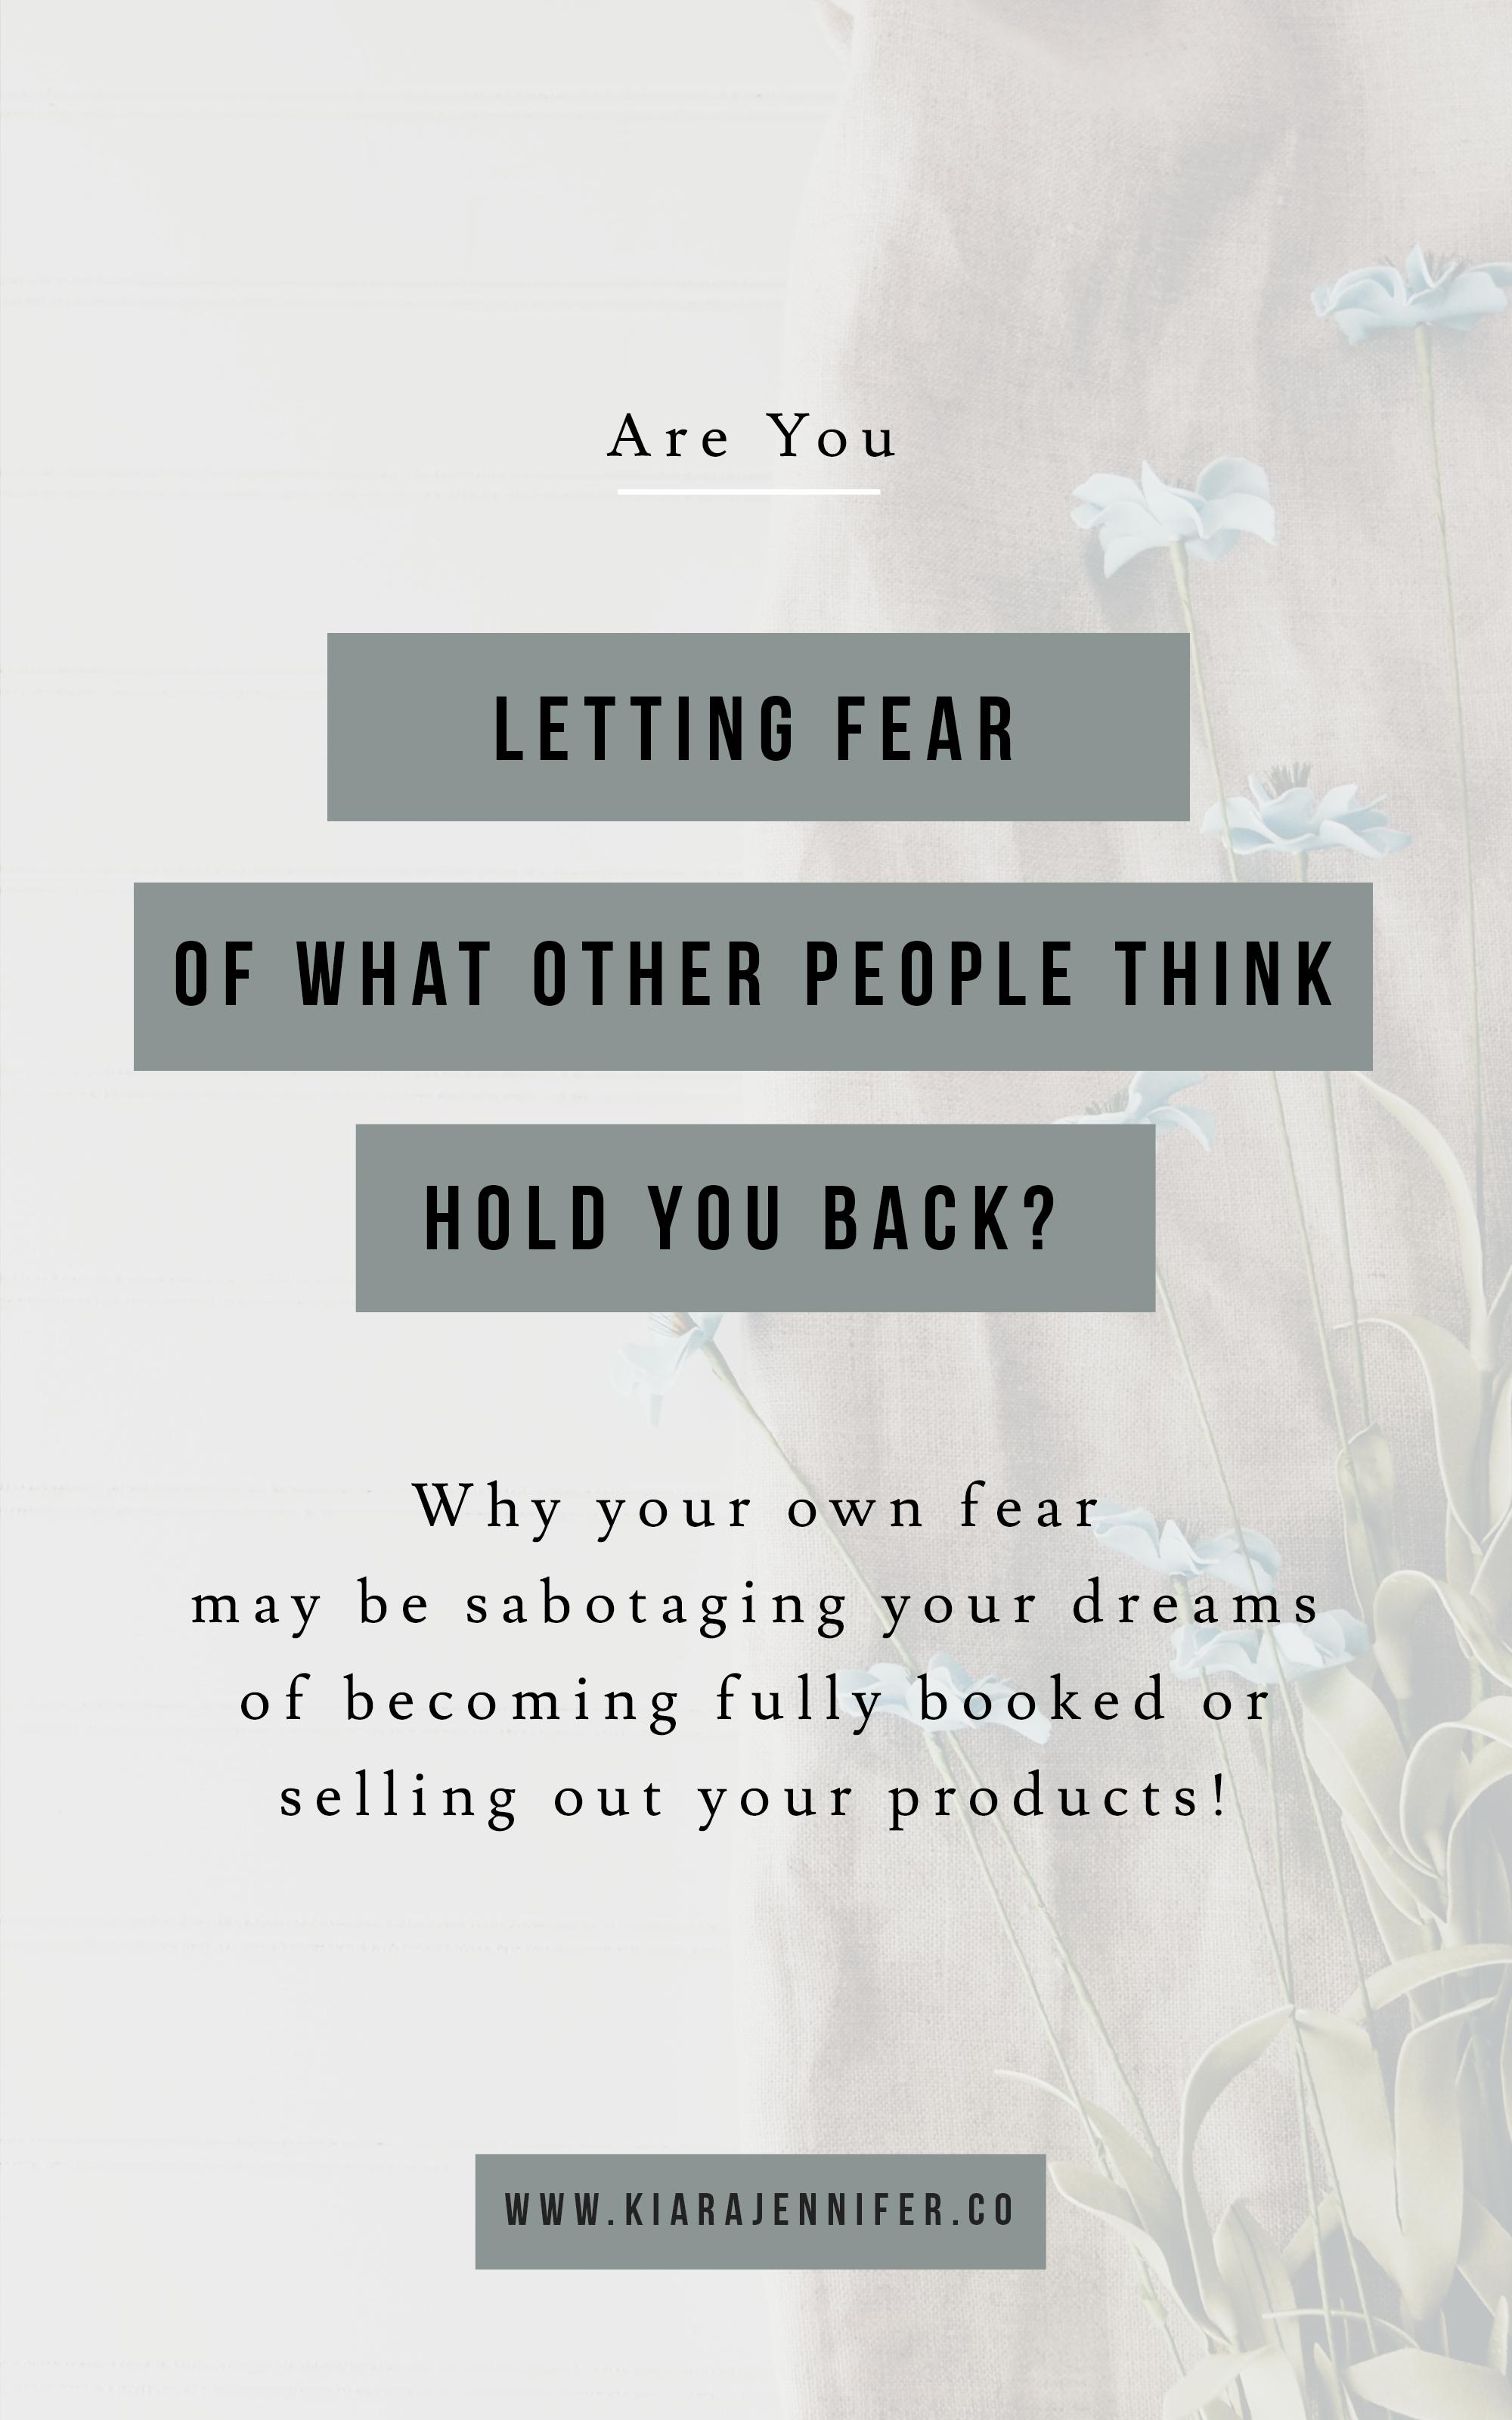 Fear Mindset | Entrepreneurship | Breaking Limiting Beliefs | Be More Visible | Kiara Jennifer & Co | Social Media Marketing | Public Relations